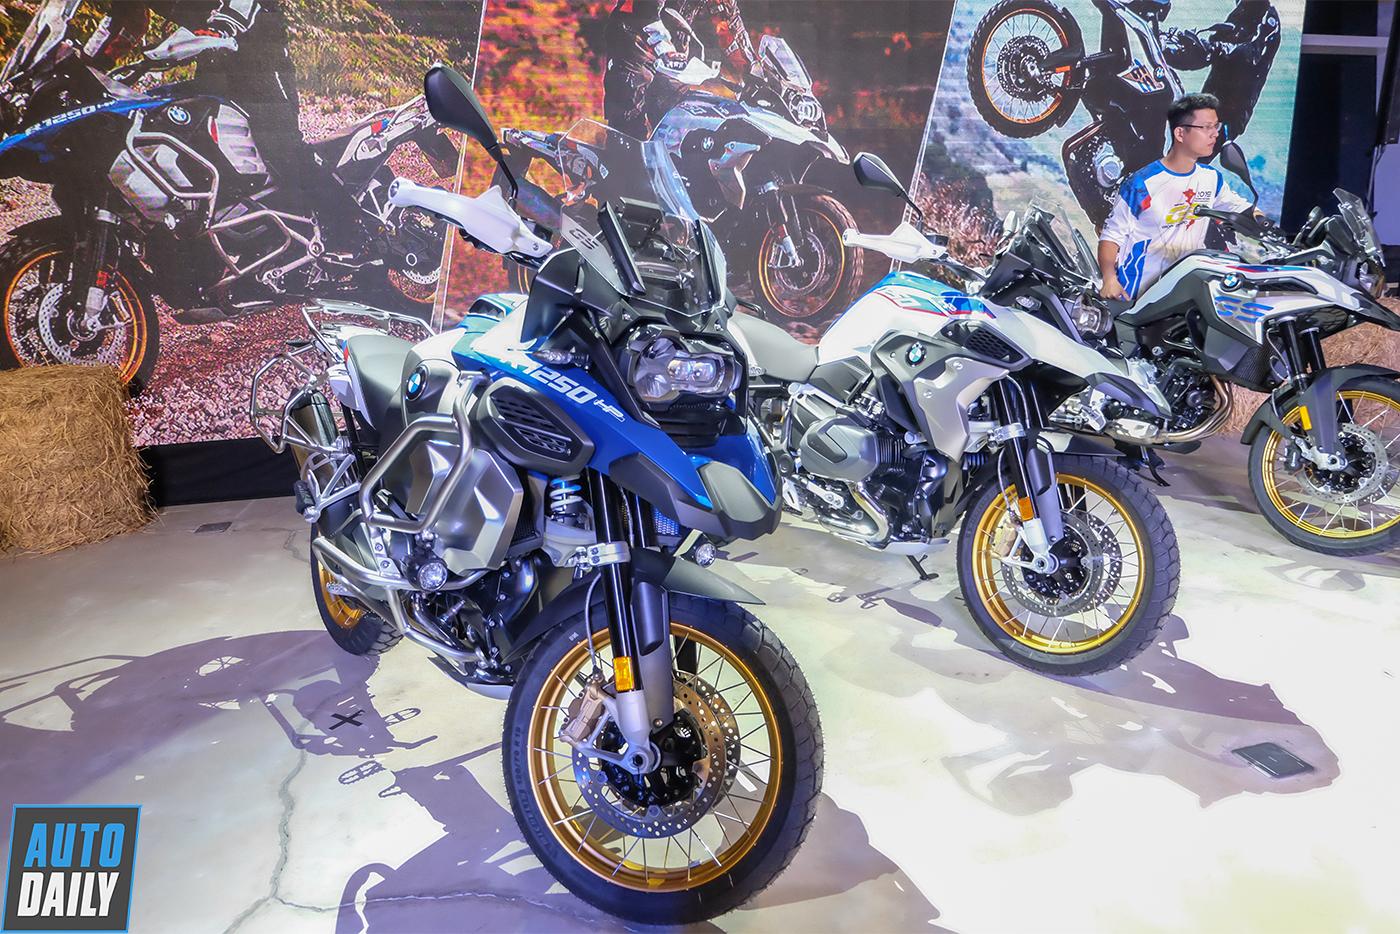 bmw-motorrad-r-1250-gs-2019-4.jpg